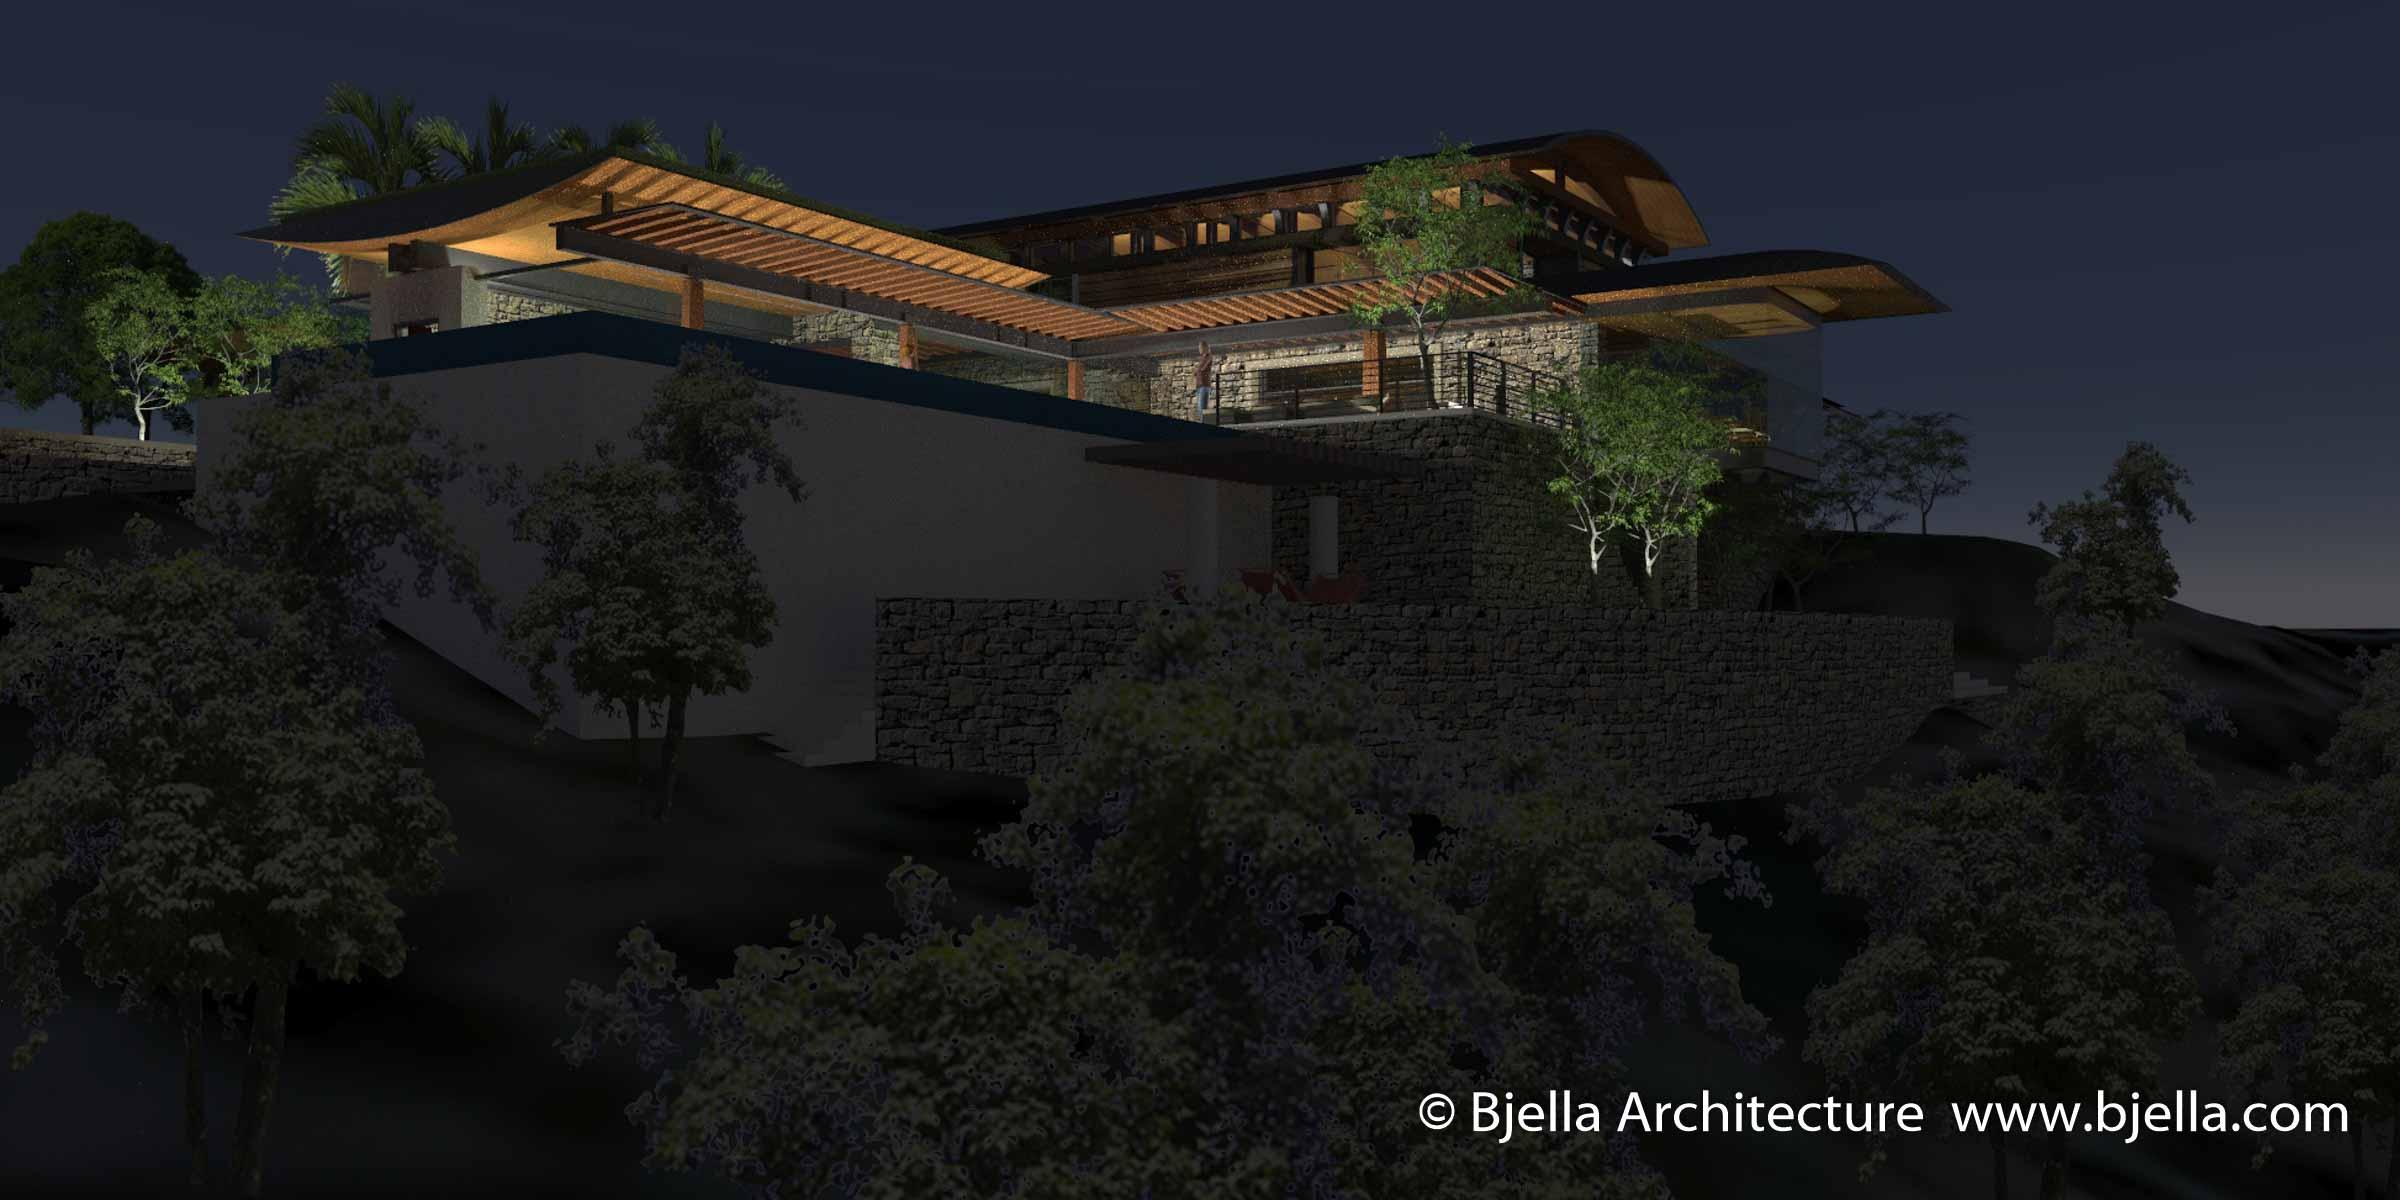 Los Angeles Hilltop Modern Glass House